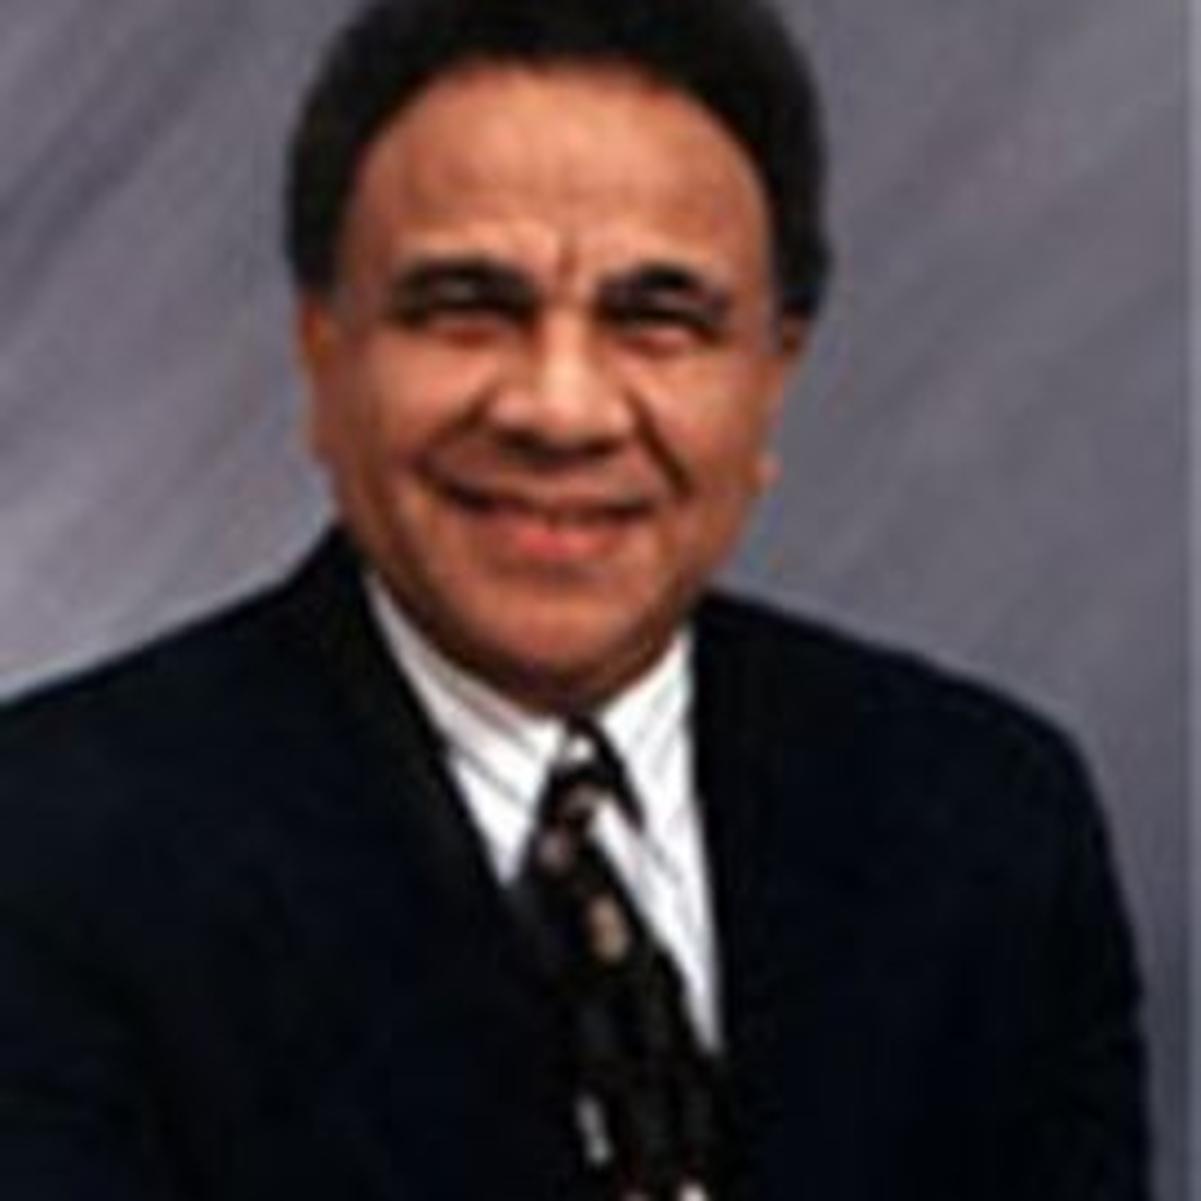 Samuel Betances